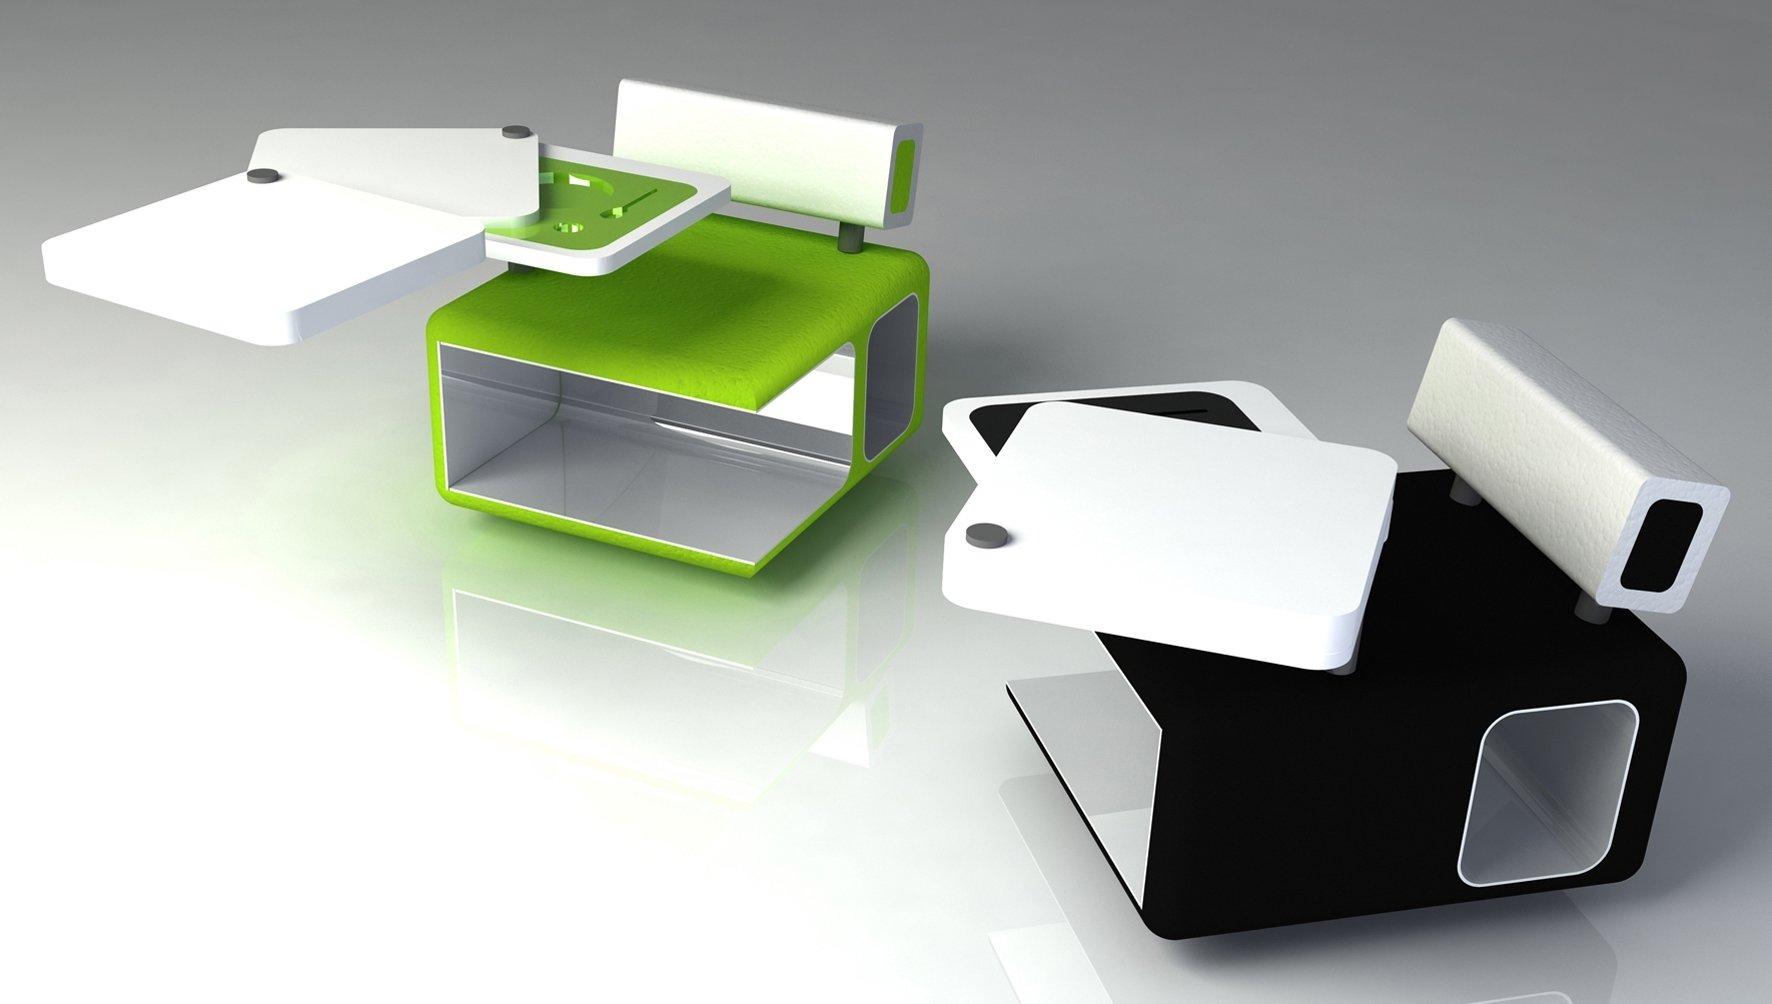 10 Fashionable Ideas For A New Product idea product design best home design ideas sondos 2021